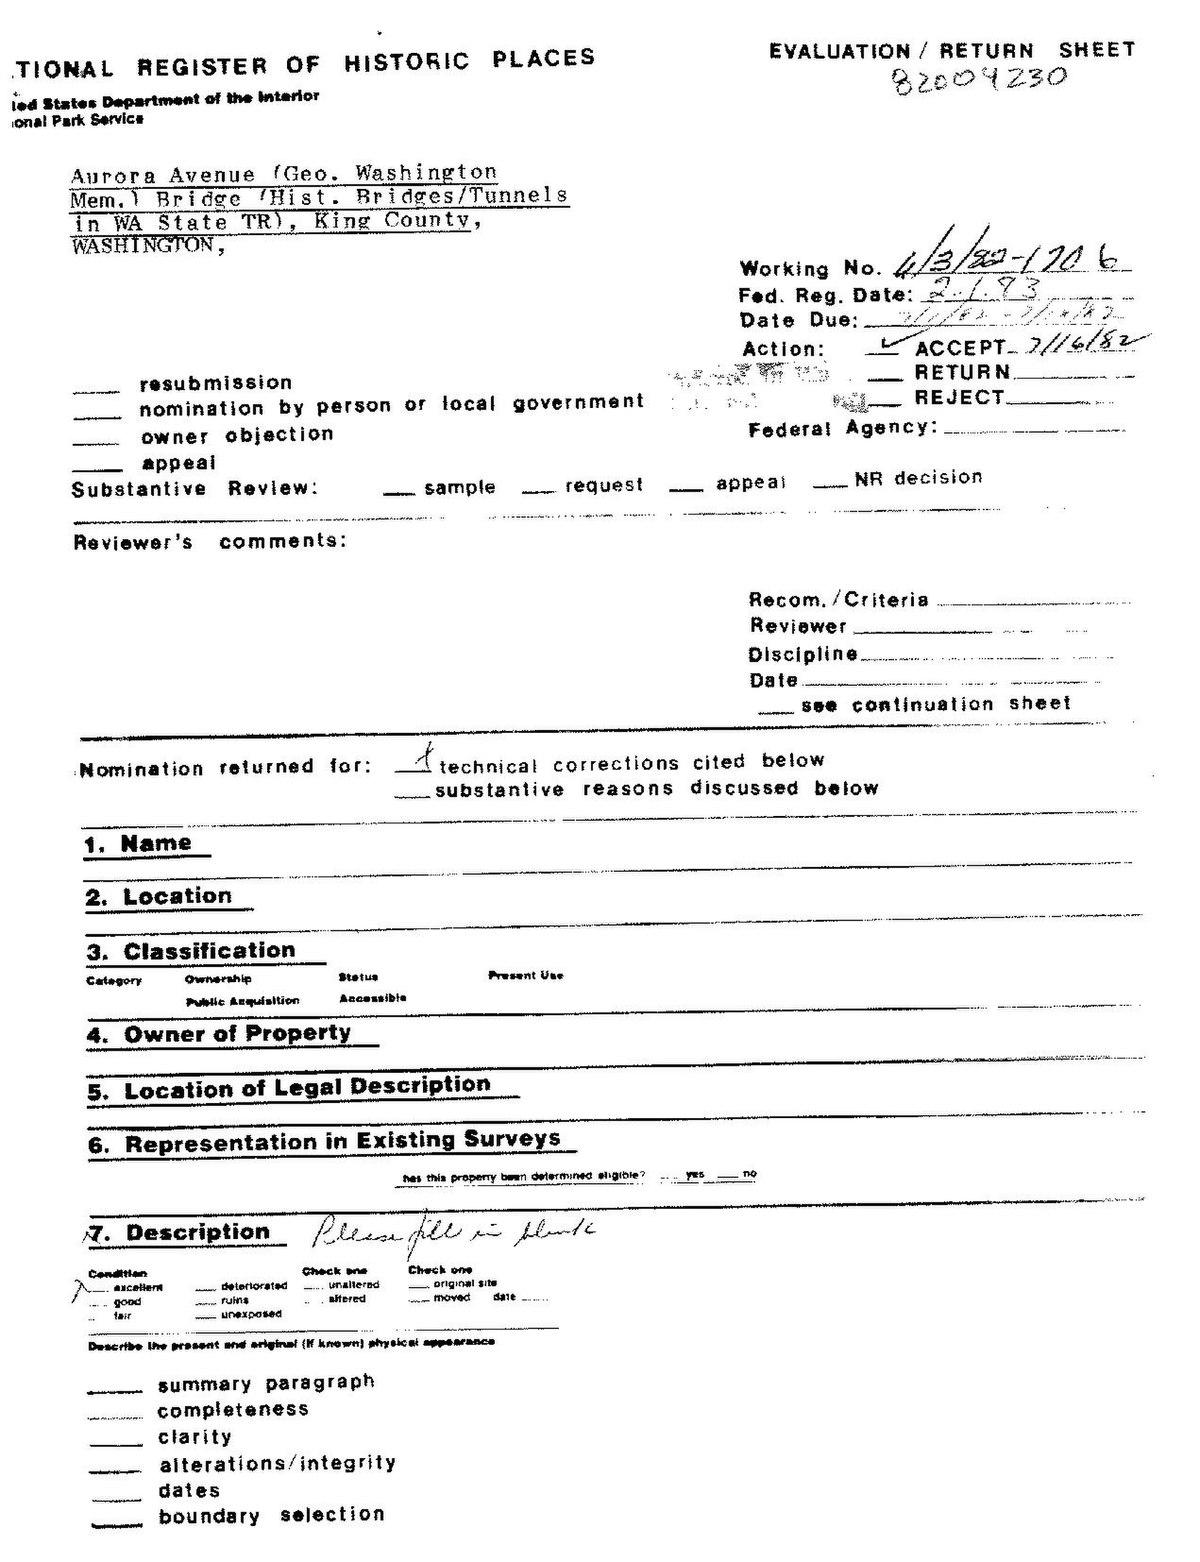 File George Washington Memorial Bridge Nomination Form